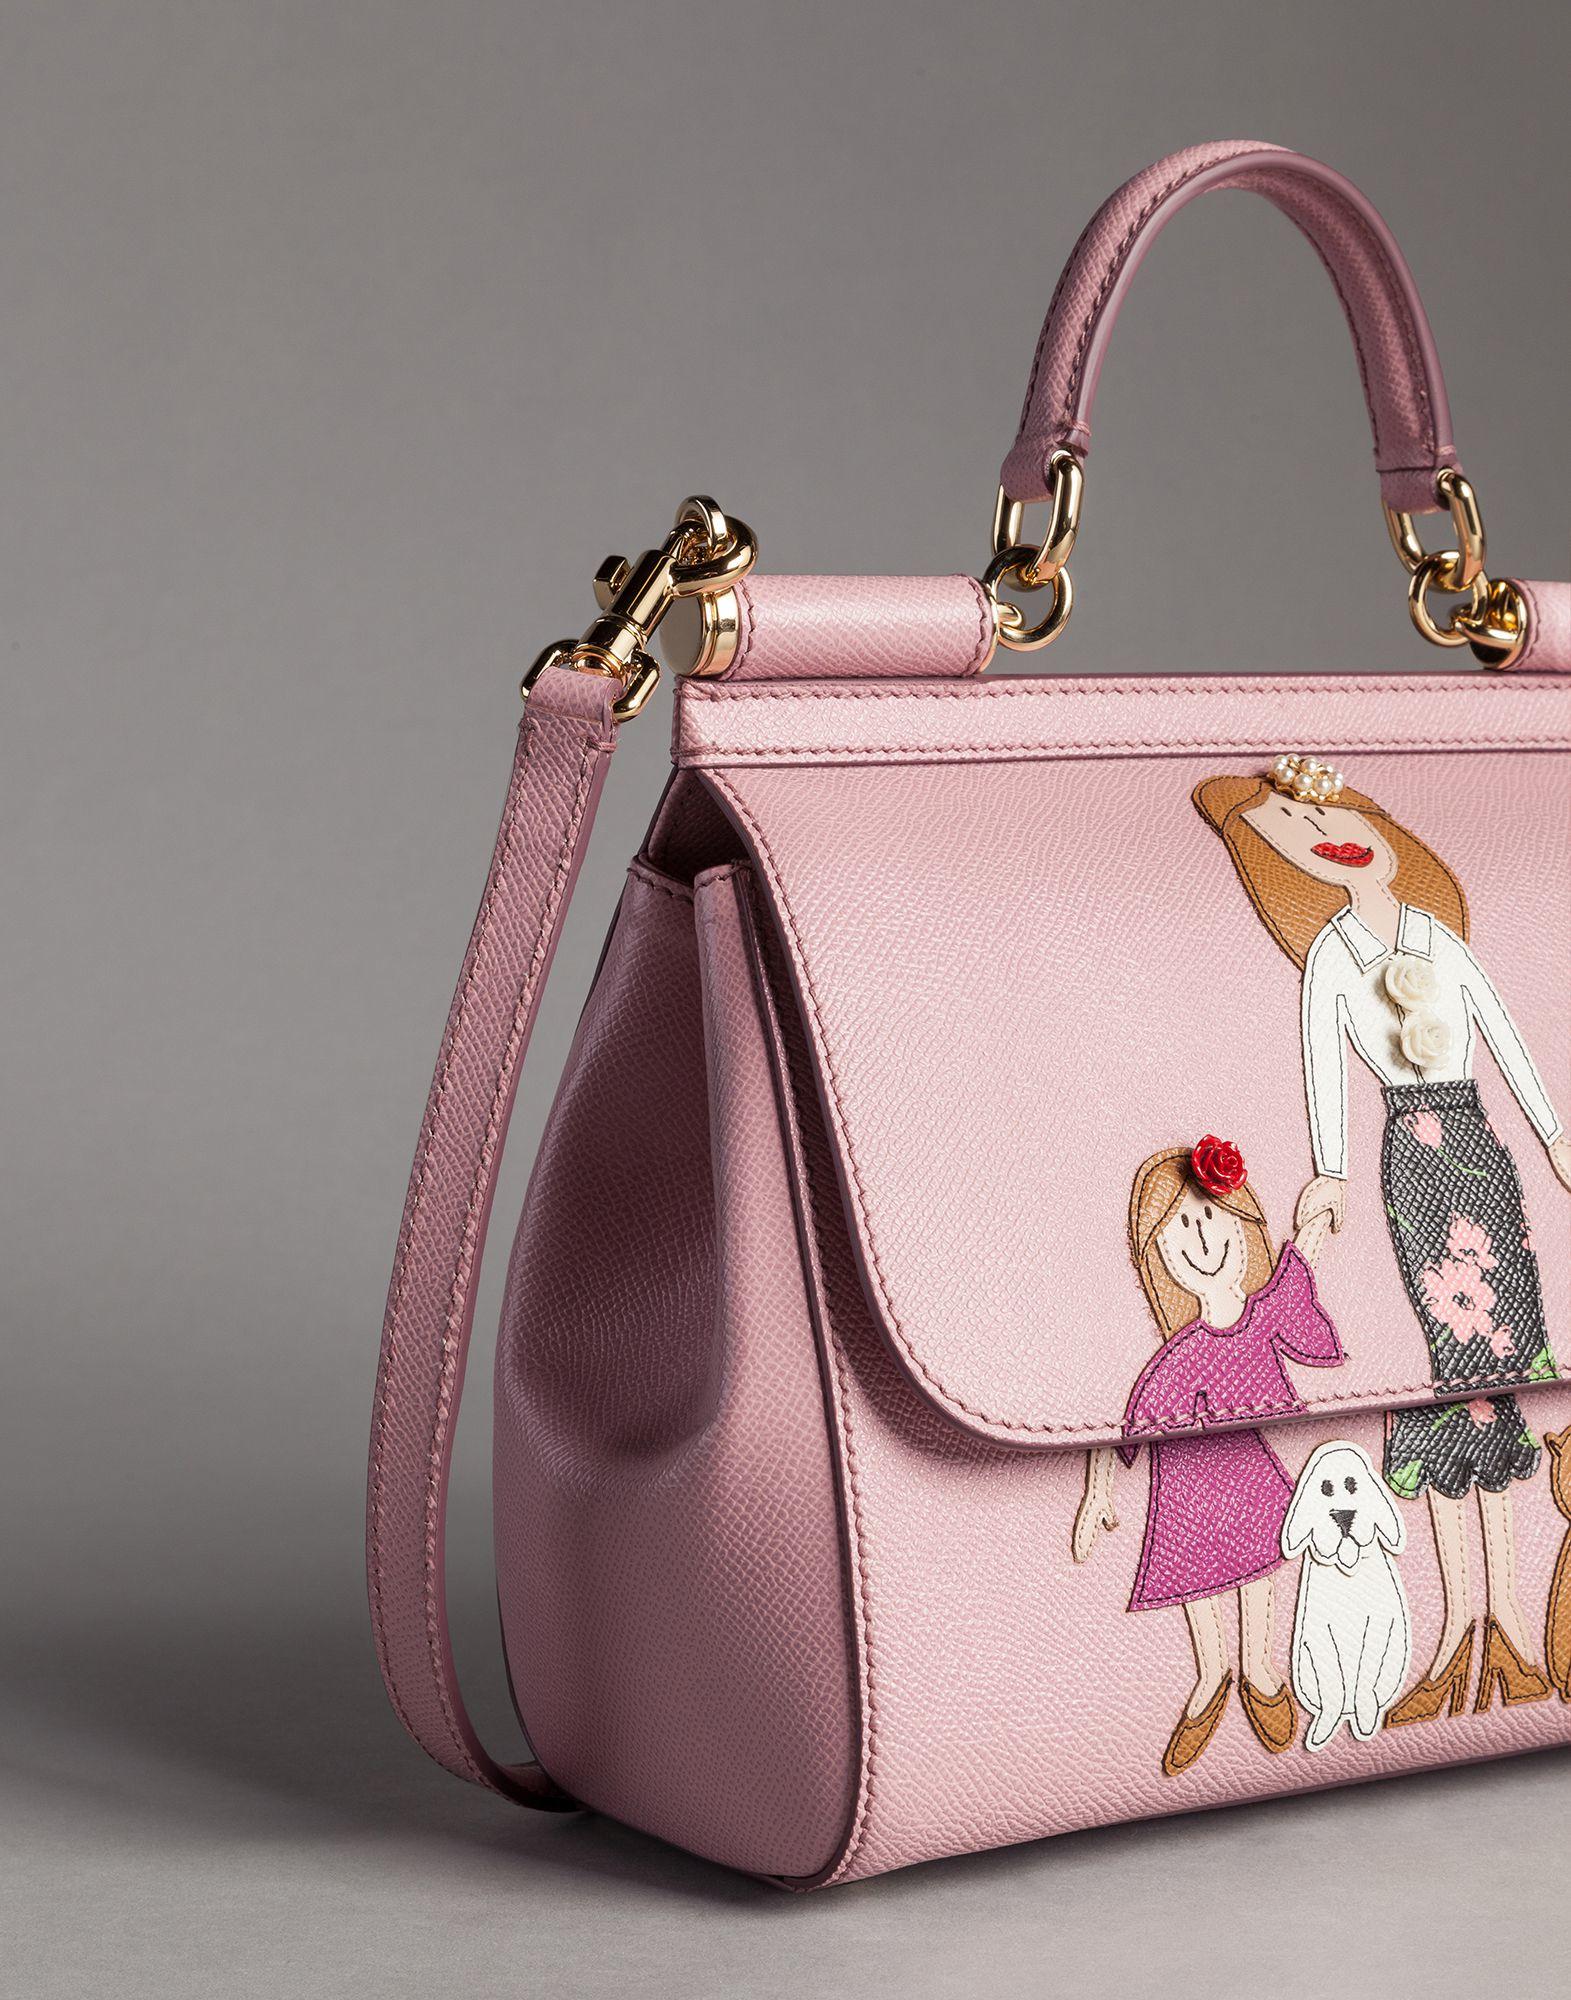 Lyst - Dolce   Gabbana Medium Dauphine Calfskin Sicily Bag With ... 7c08a5a53e820